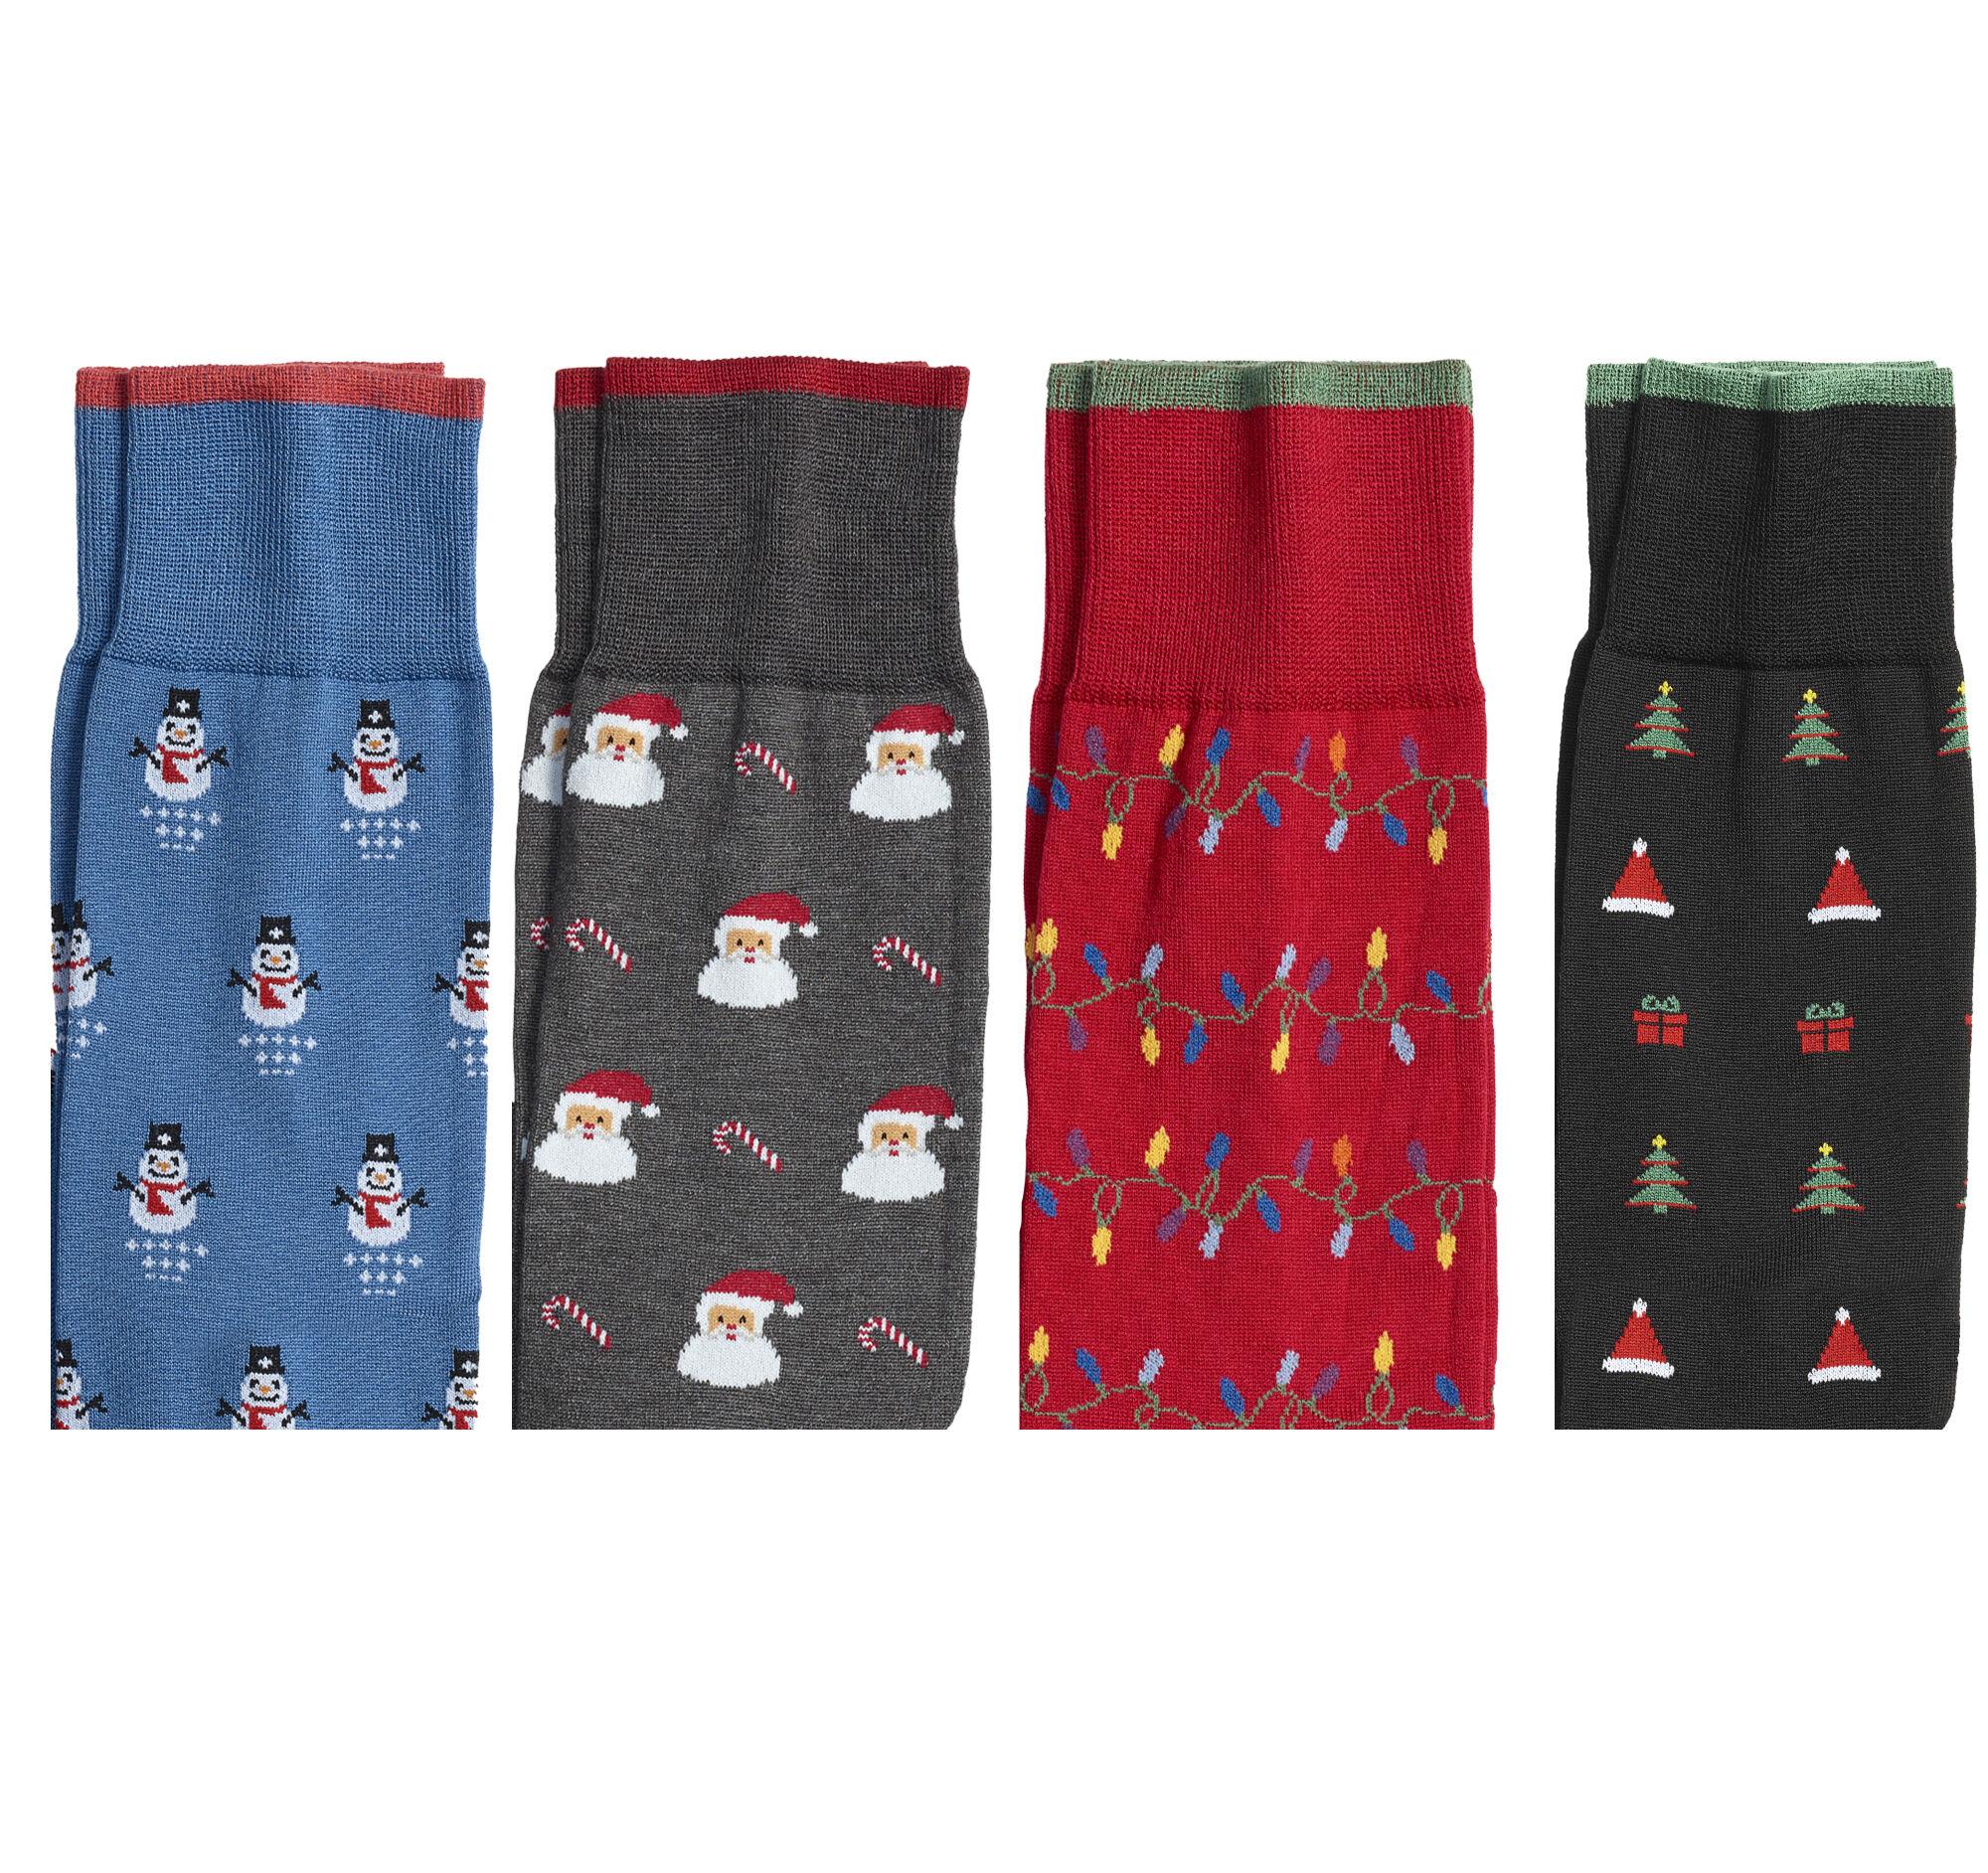 Novelty Socks Gift Box; Novelty Socks Gift Box